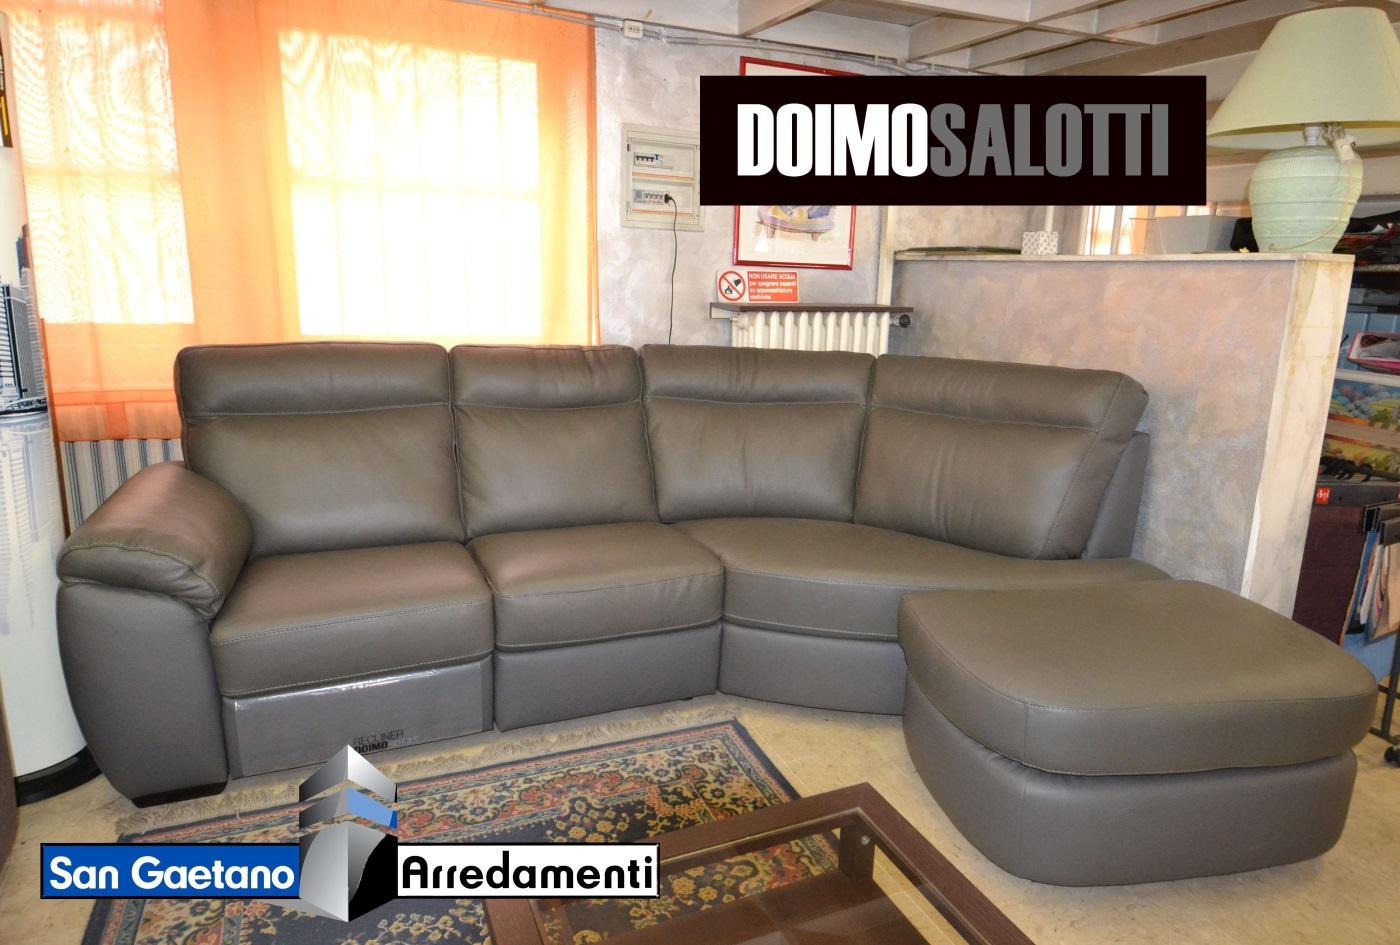 Offerta divano doimo salotti modello charles san gaetano arredamenti - Divano doimo prezzo ...